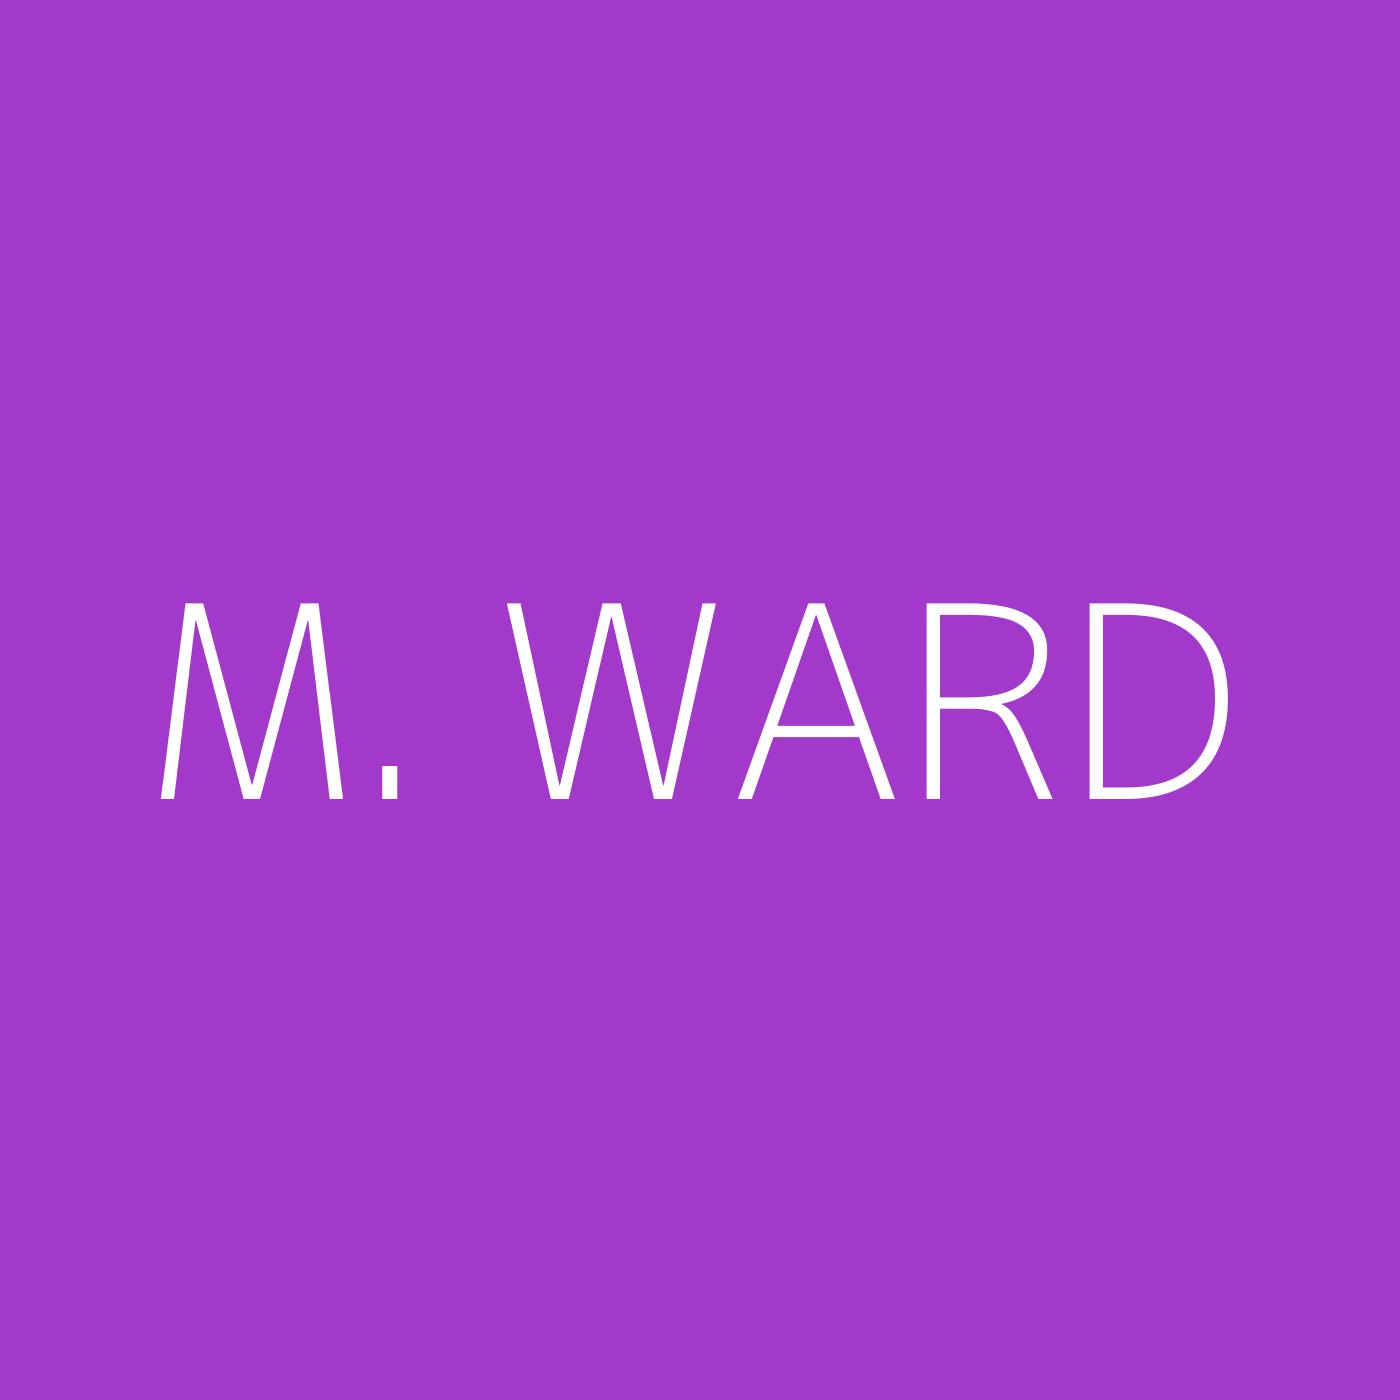 M. Ward Playlist Artwork